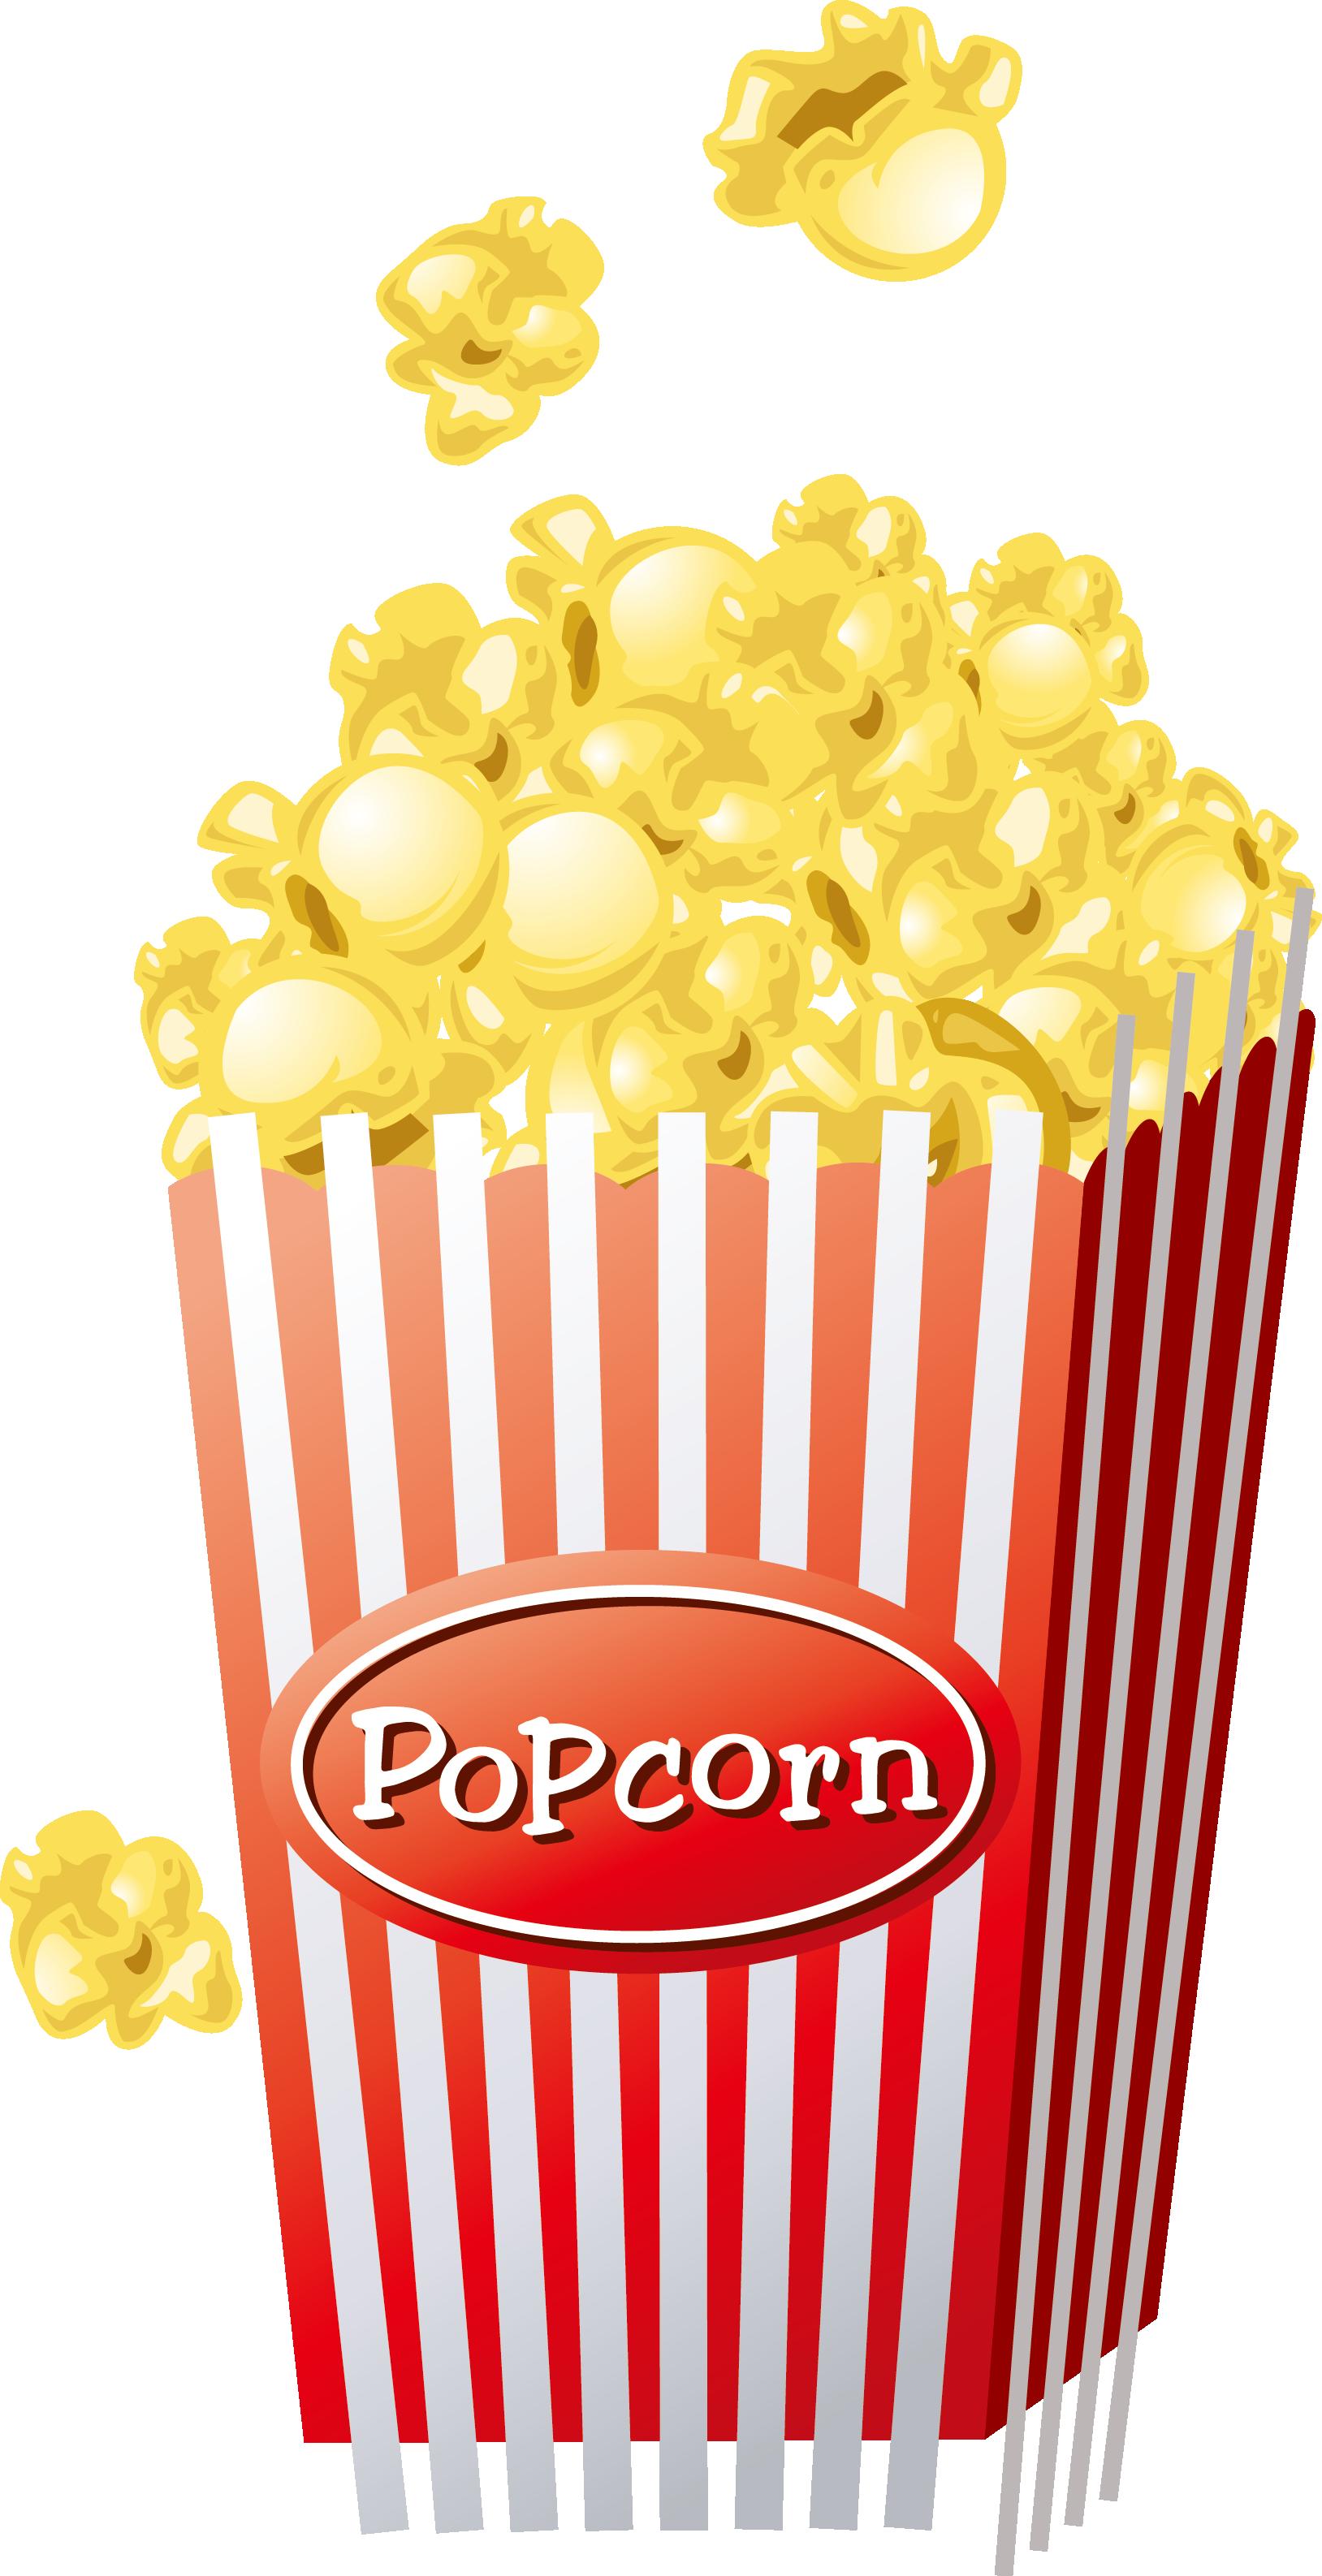 svg transparent stock Caramel corn ice cream. Drawing something popcorn